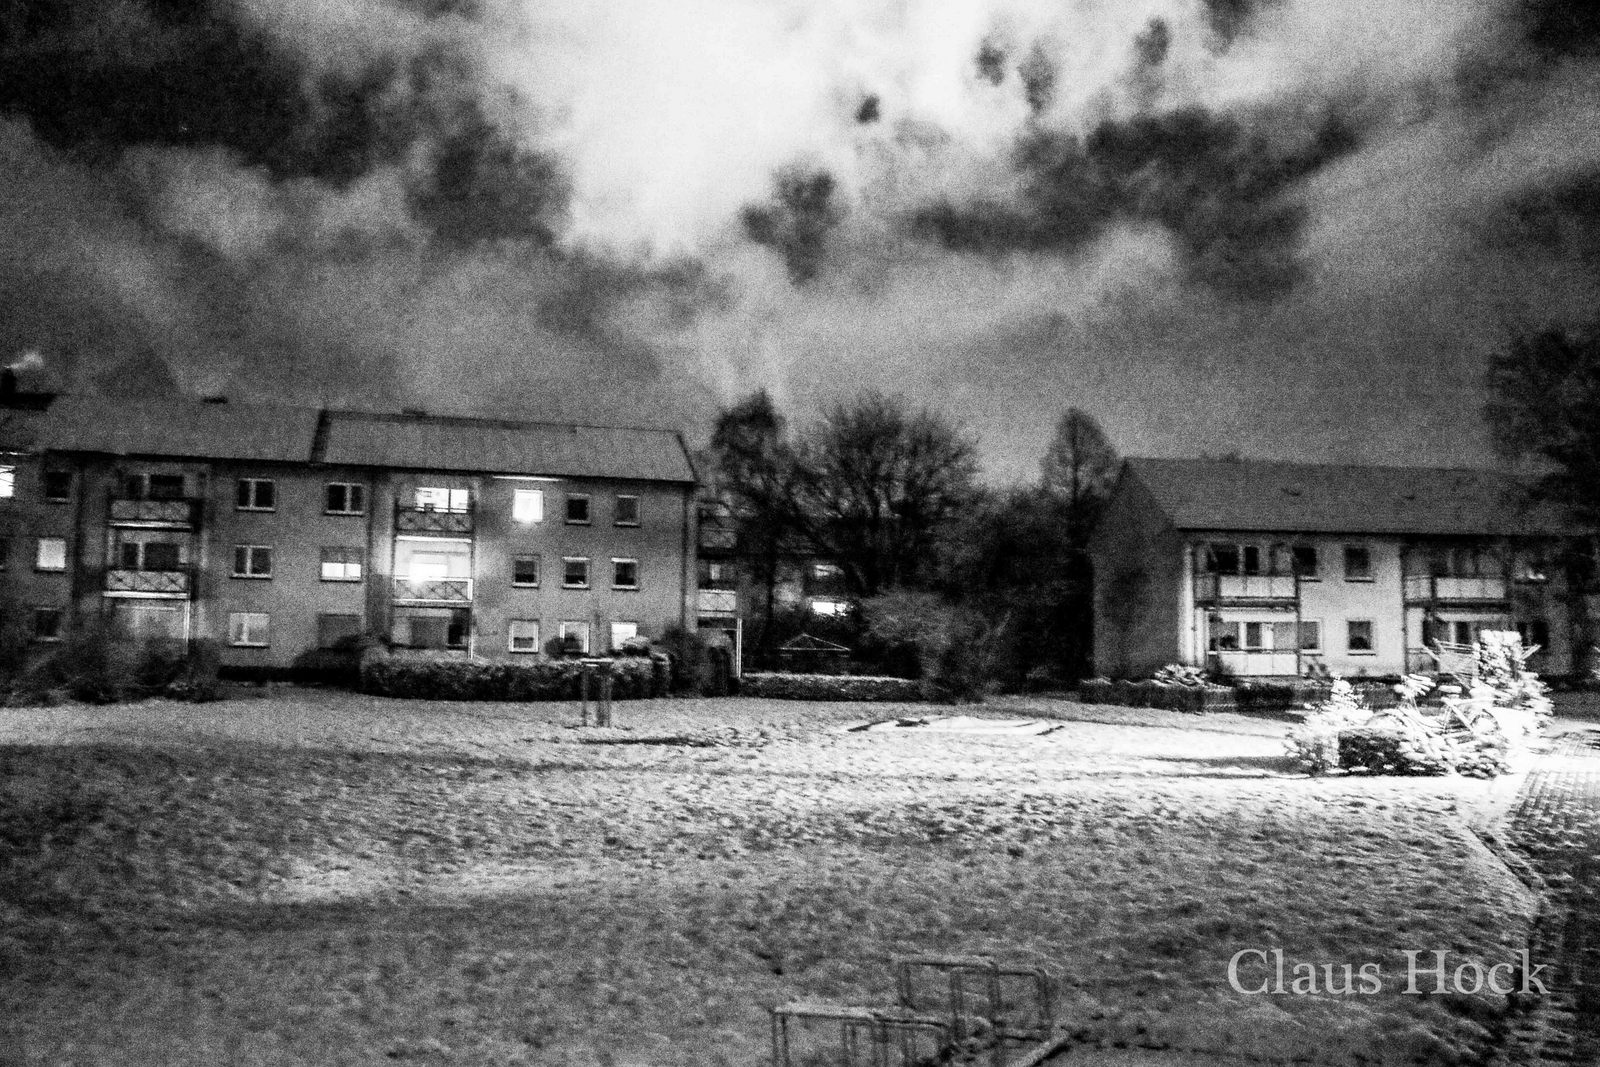 Hock - Schnee Januar 2016-5